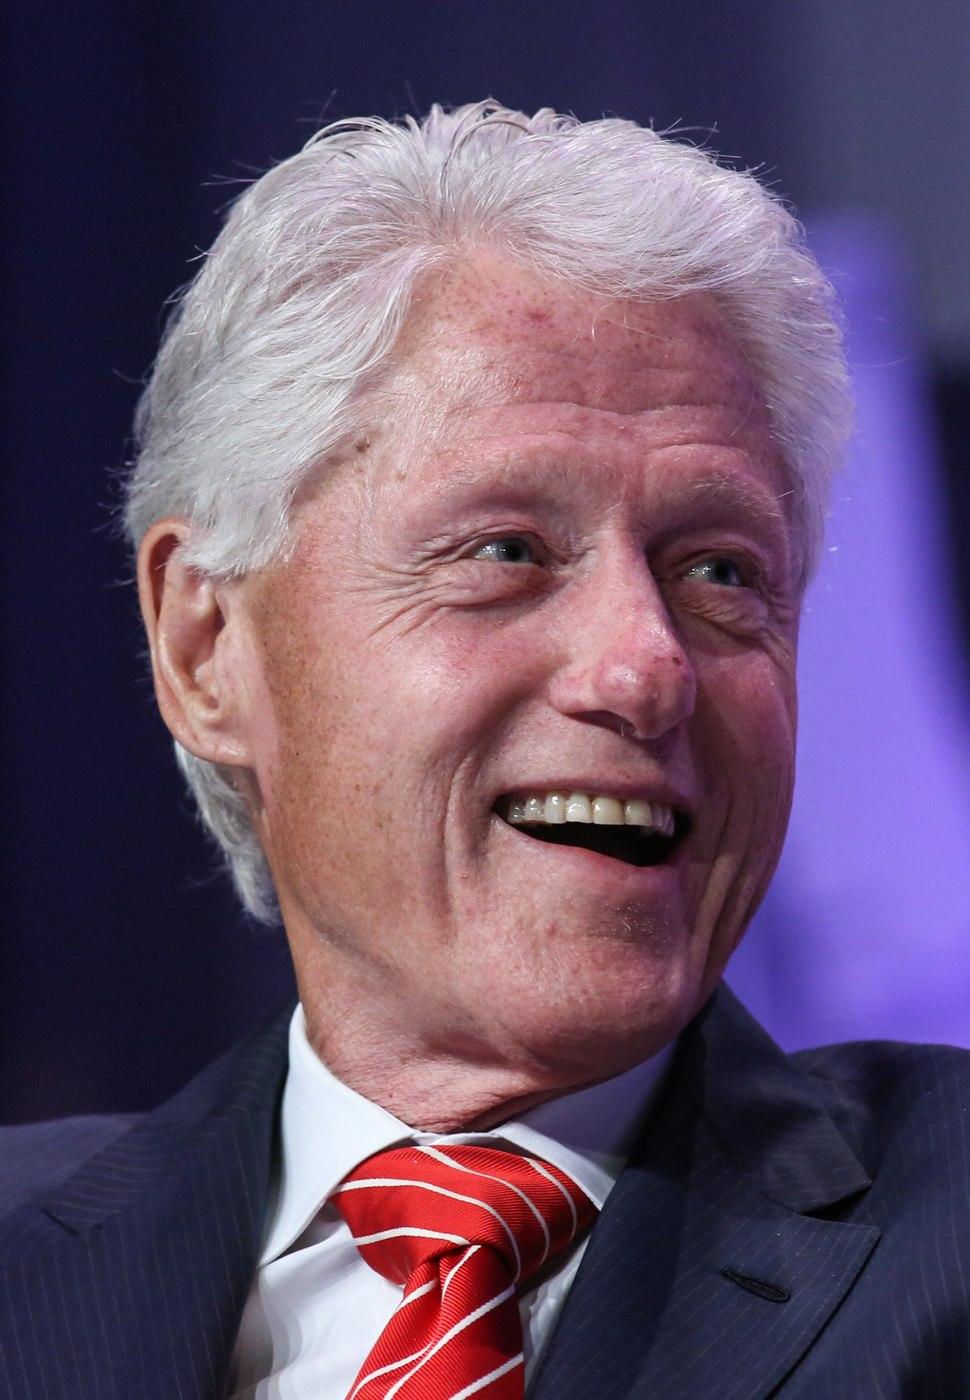 Clinton 2k15